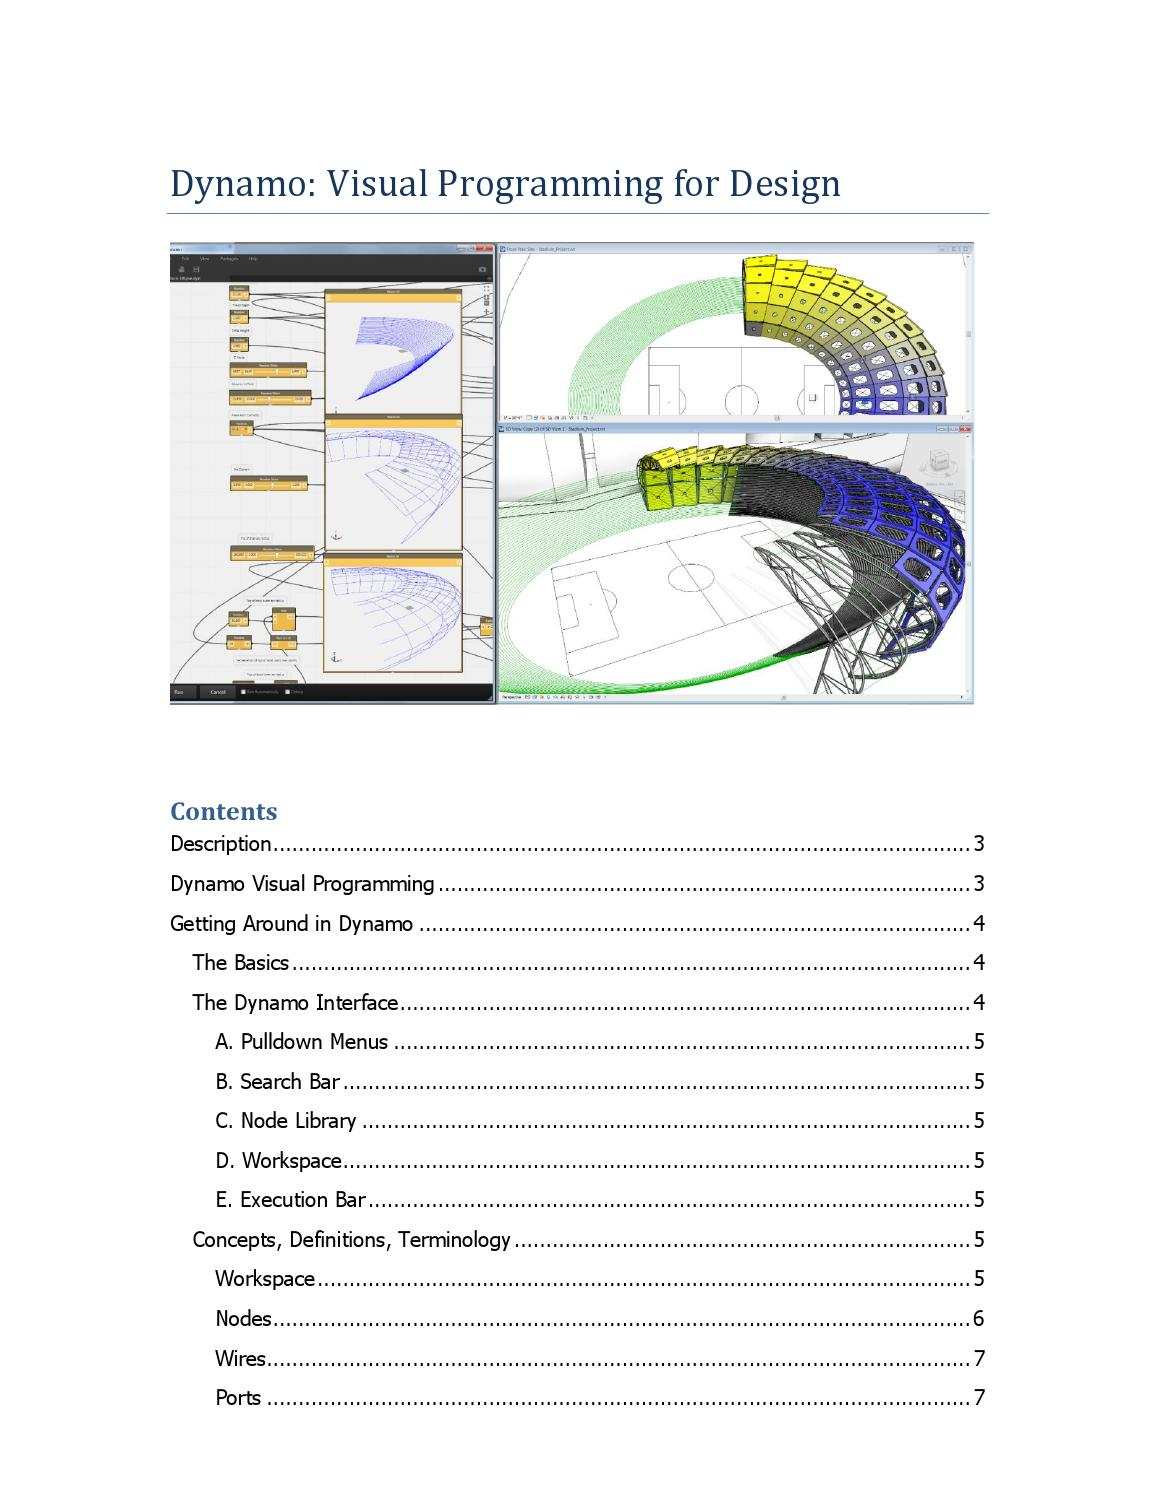 Dynamo visual programming for design by Дмитрий Дронов - issuu